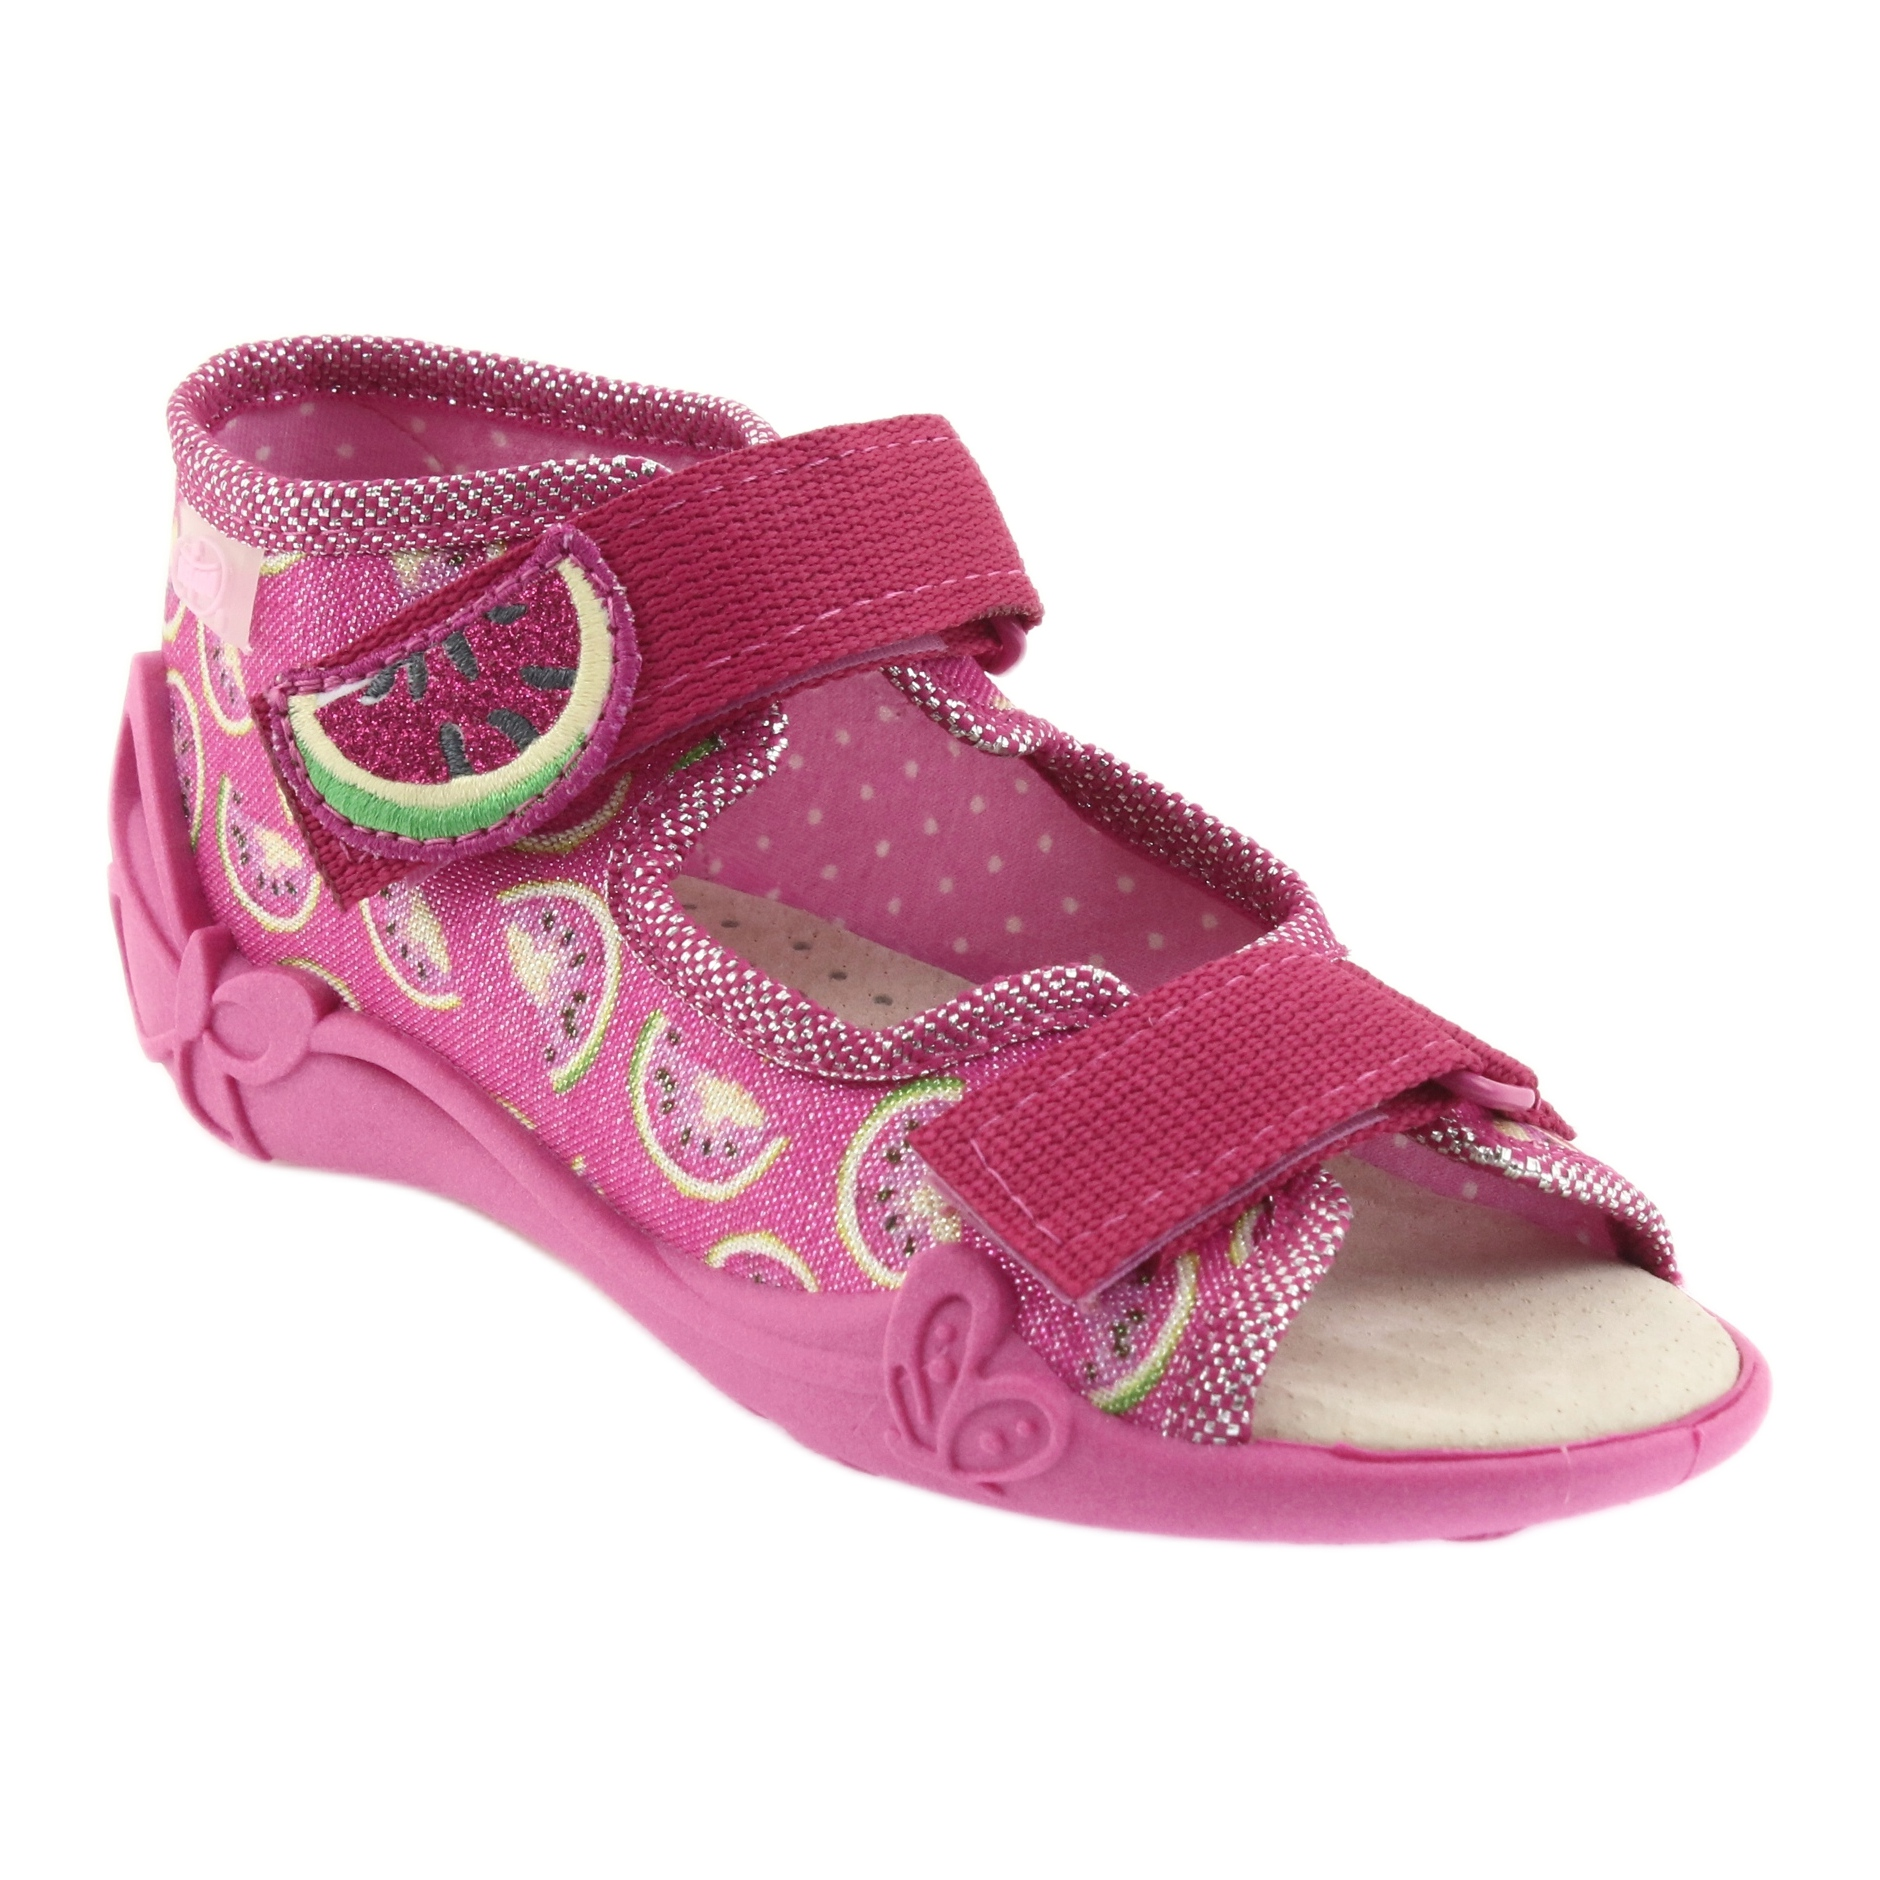 miniatura 2 - Sandali Befado scarpe da bambino 342P004 angurie grigio verde giallo rosa